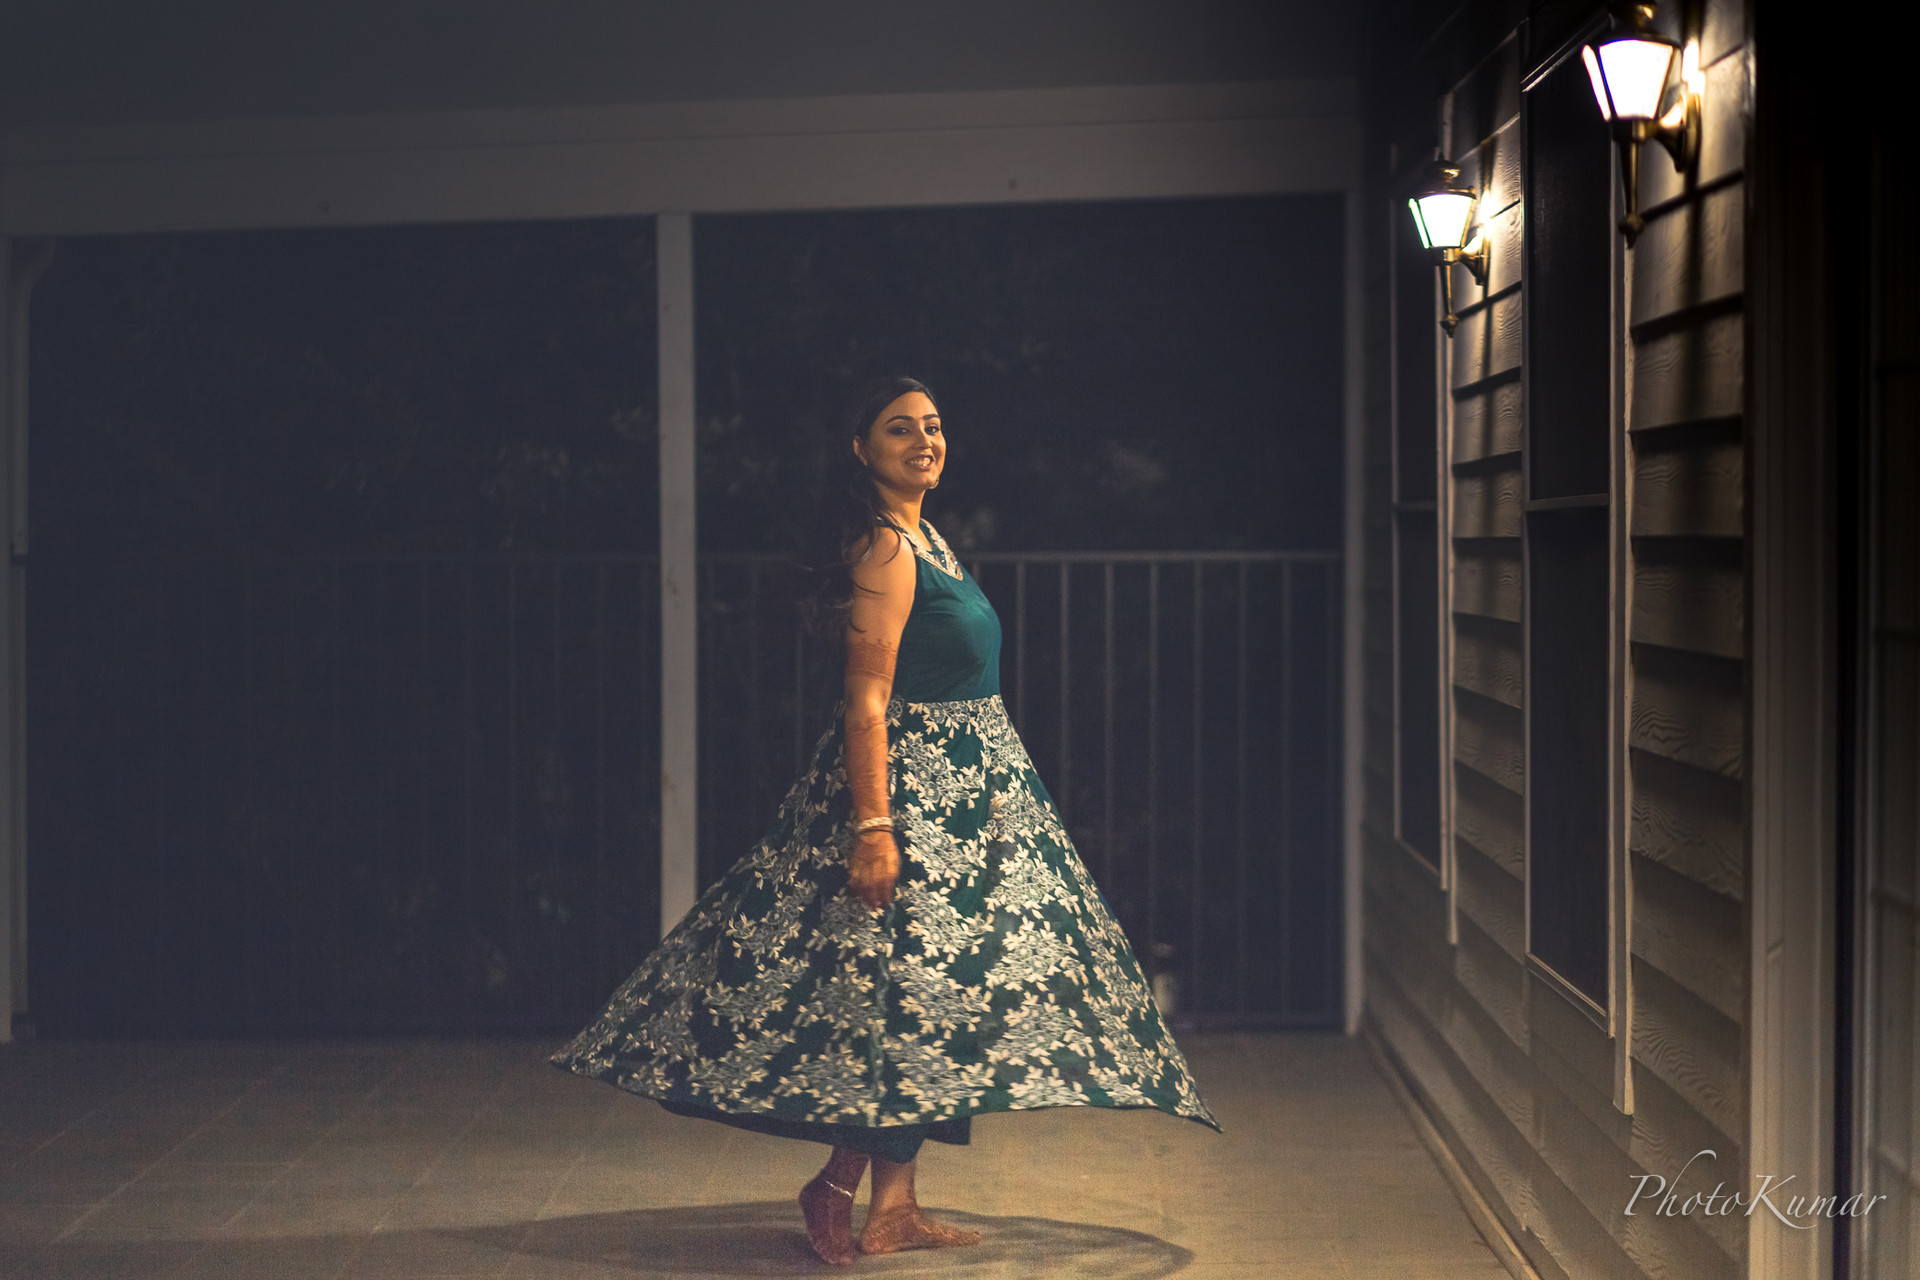 Photokumar-islamic-wedding-dallas-fort-worth-2018-3.jpg